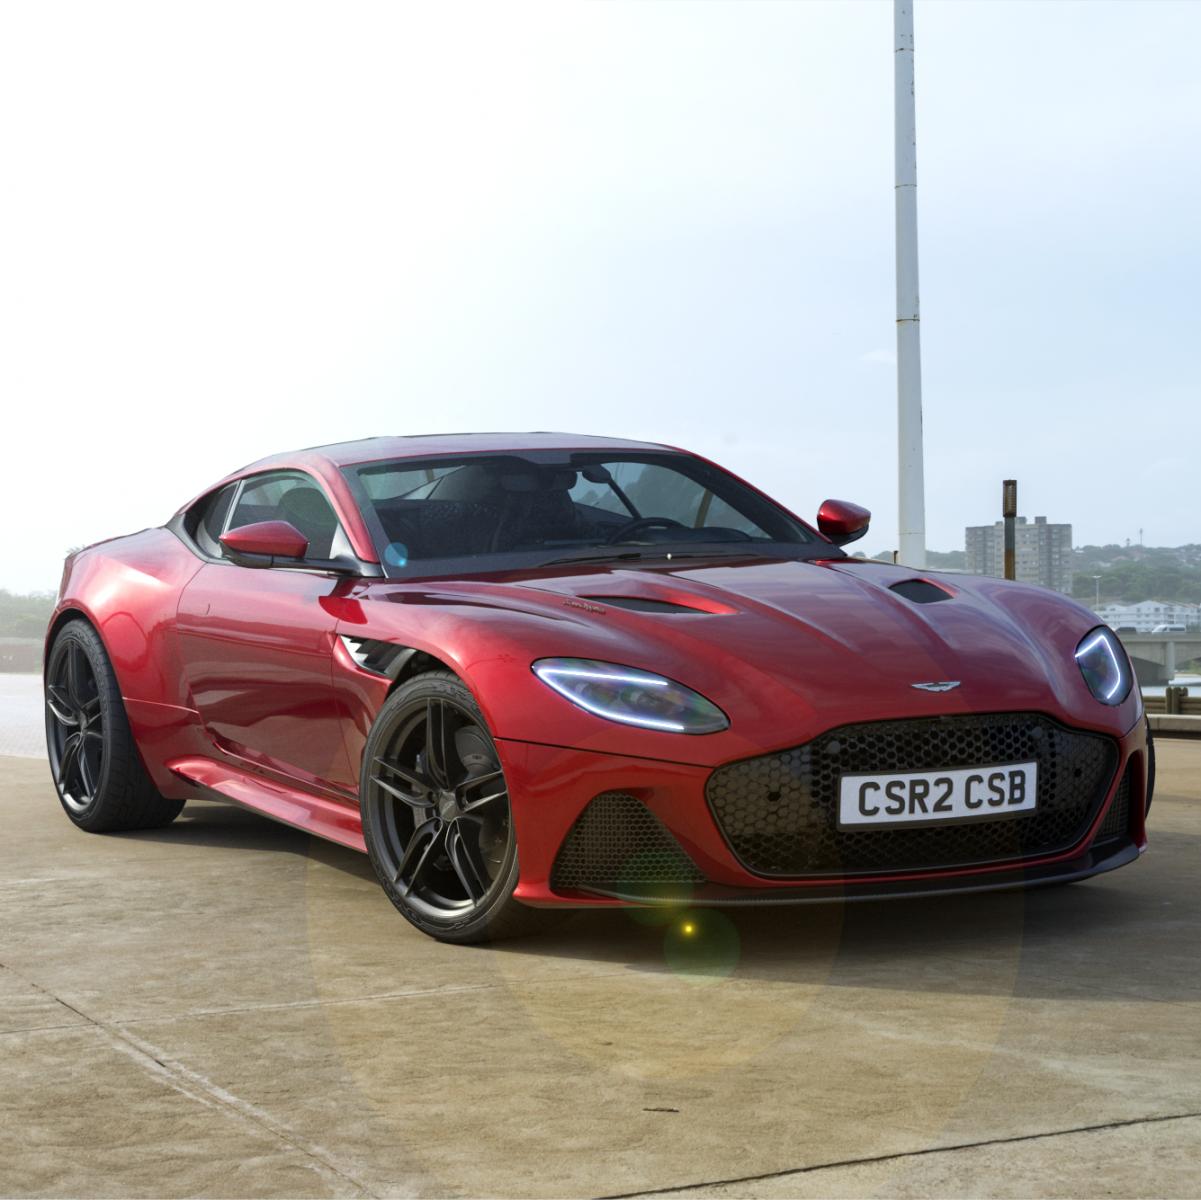 Aston Martin DBS Superleggera 2019 from CSR2